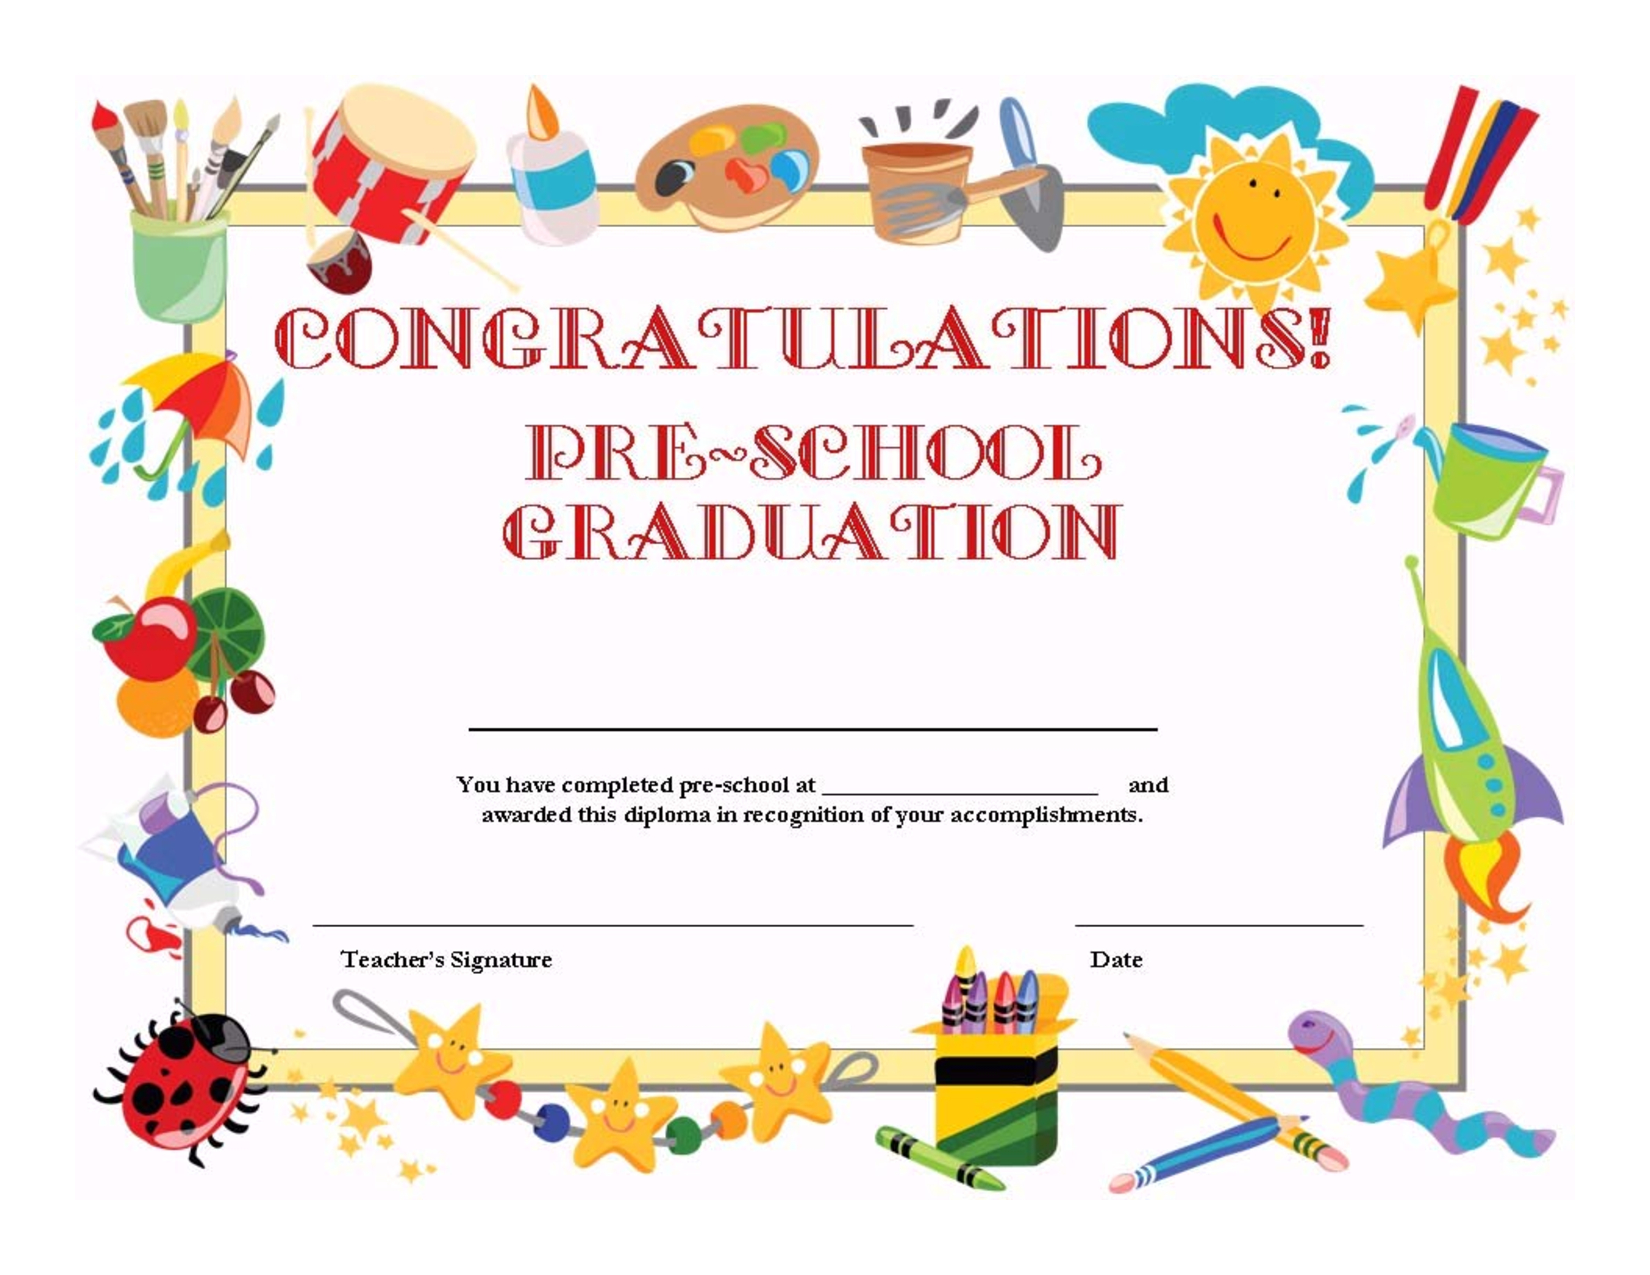 Preschool Graduation Certificate Template Free Pertaining To 5Th Grade Graduation Certificate Template